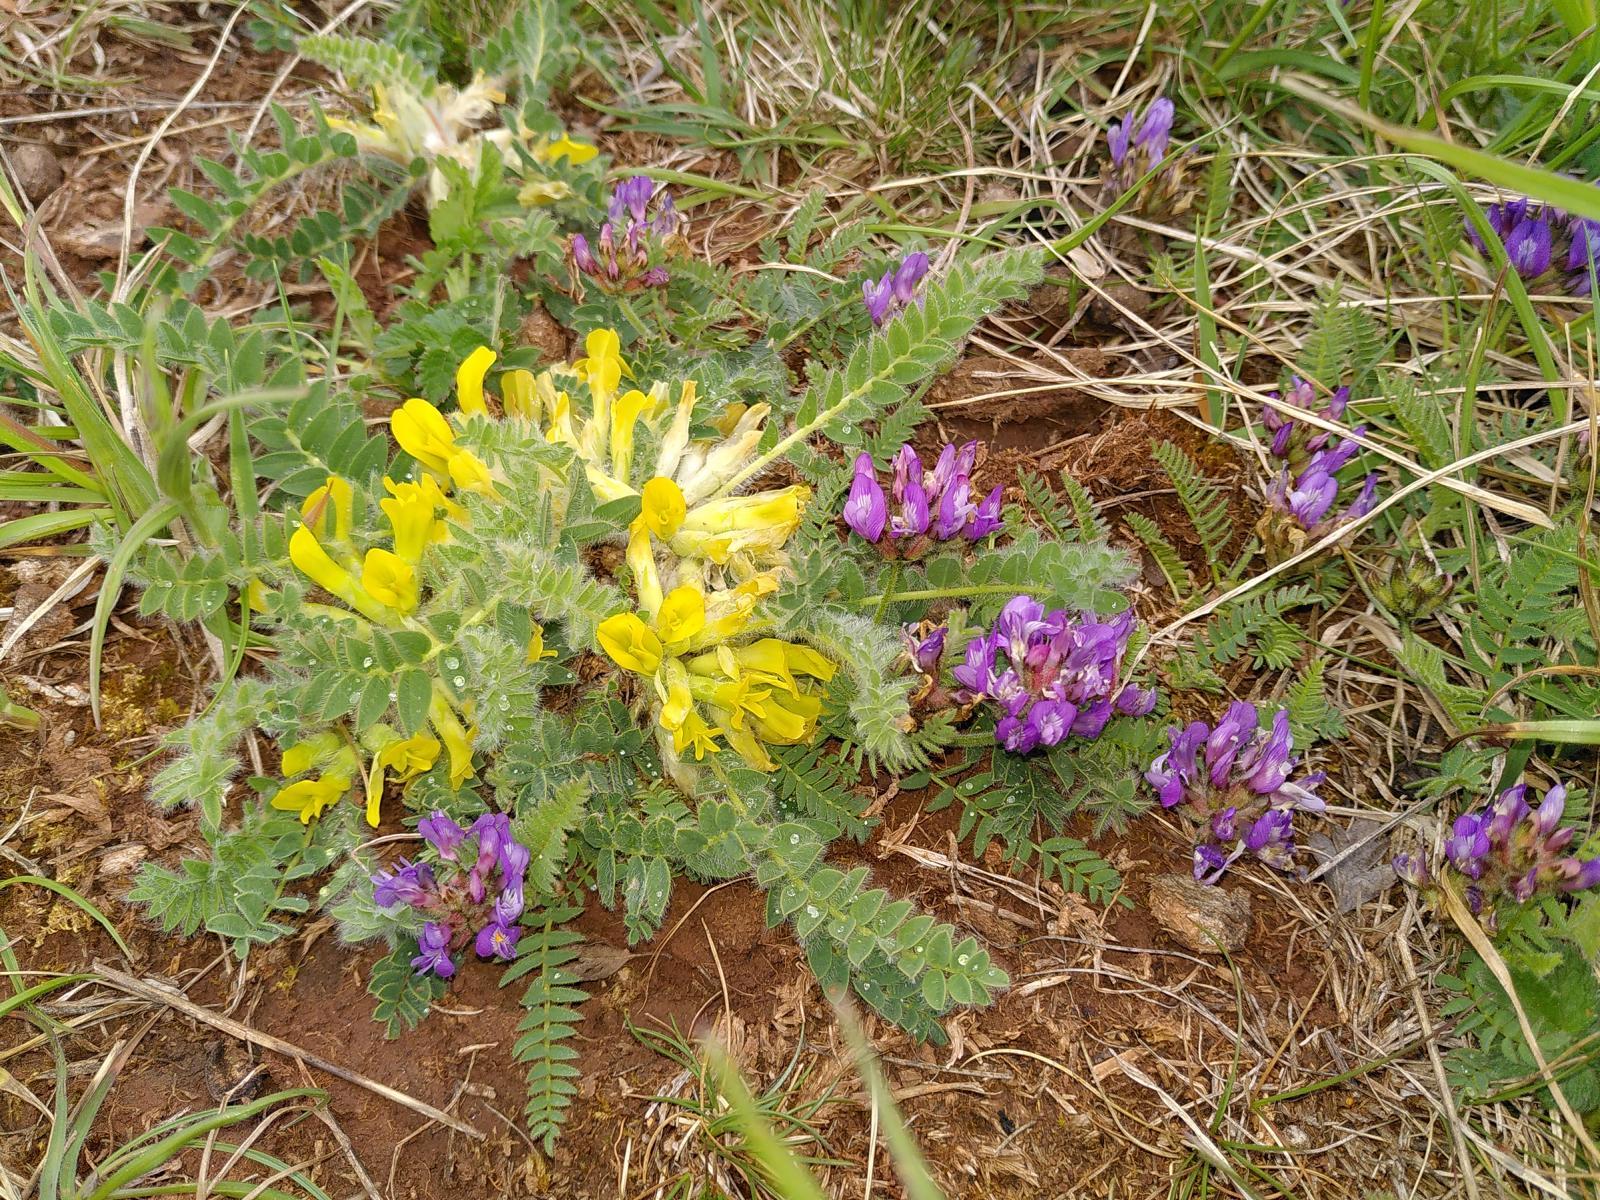 2_Astragalus-exscapus-und-A.-danicus-GRUENHAGE-Vera-Seeburg-Galgenberg-03.05.2020